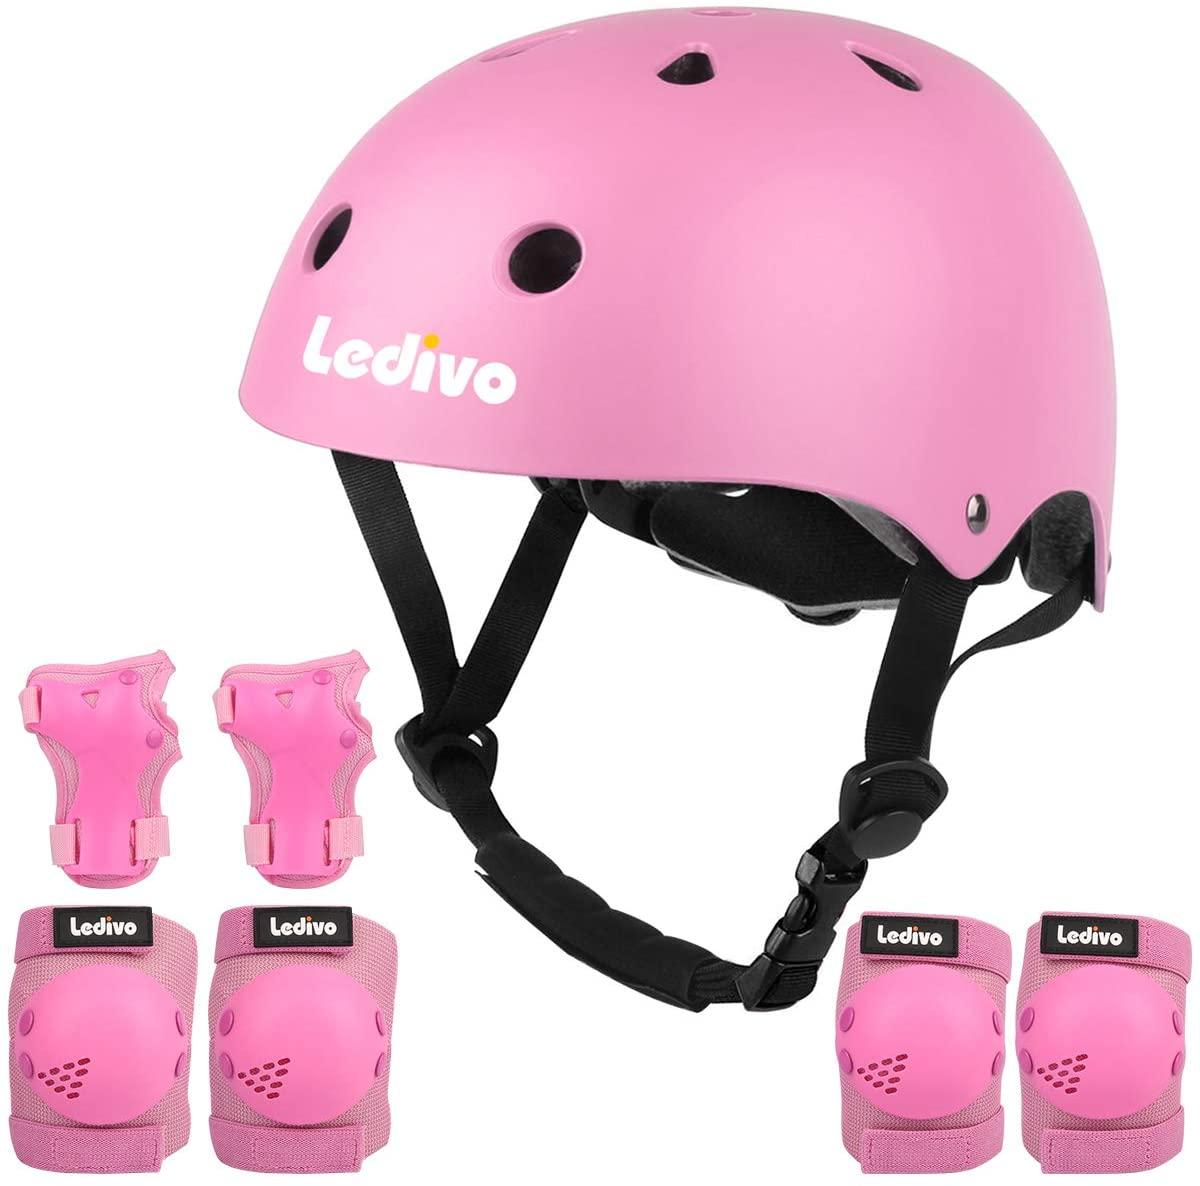 LEDIVO Kids Adjustable Bike Helmet Toddler Helmet for Kids 3-8 Years Girls Boys, Sport Protective Gear Set Knee Elbow Wrist Pads for Roller Skating Skateboard BMX Scooter Cycling